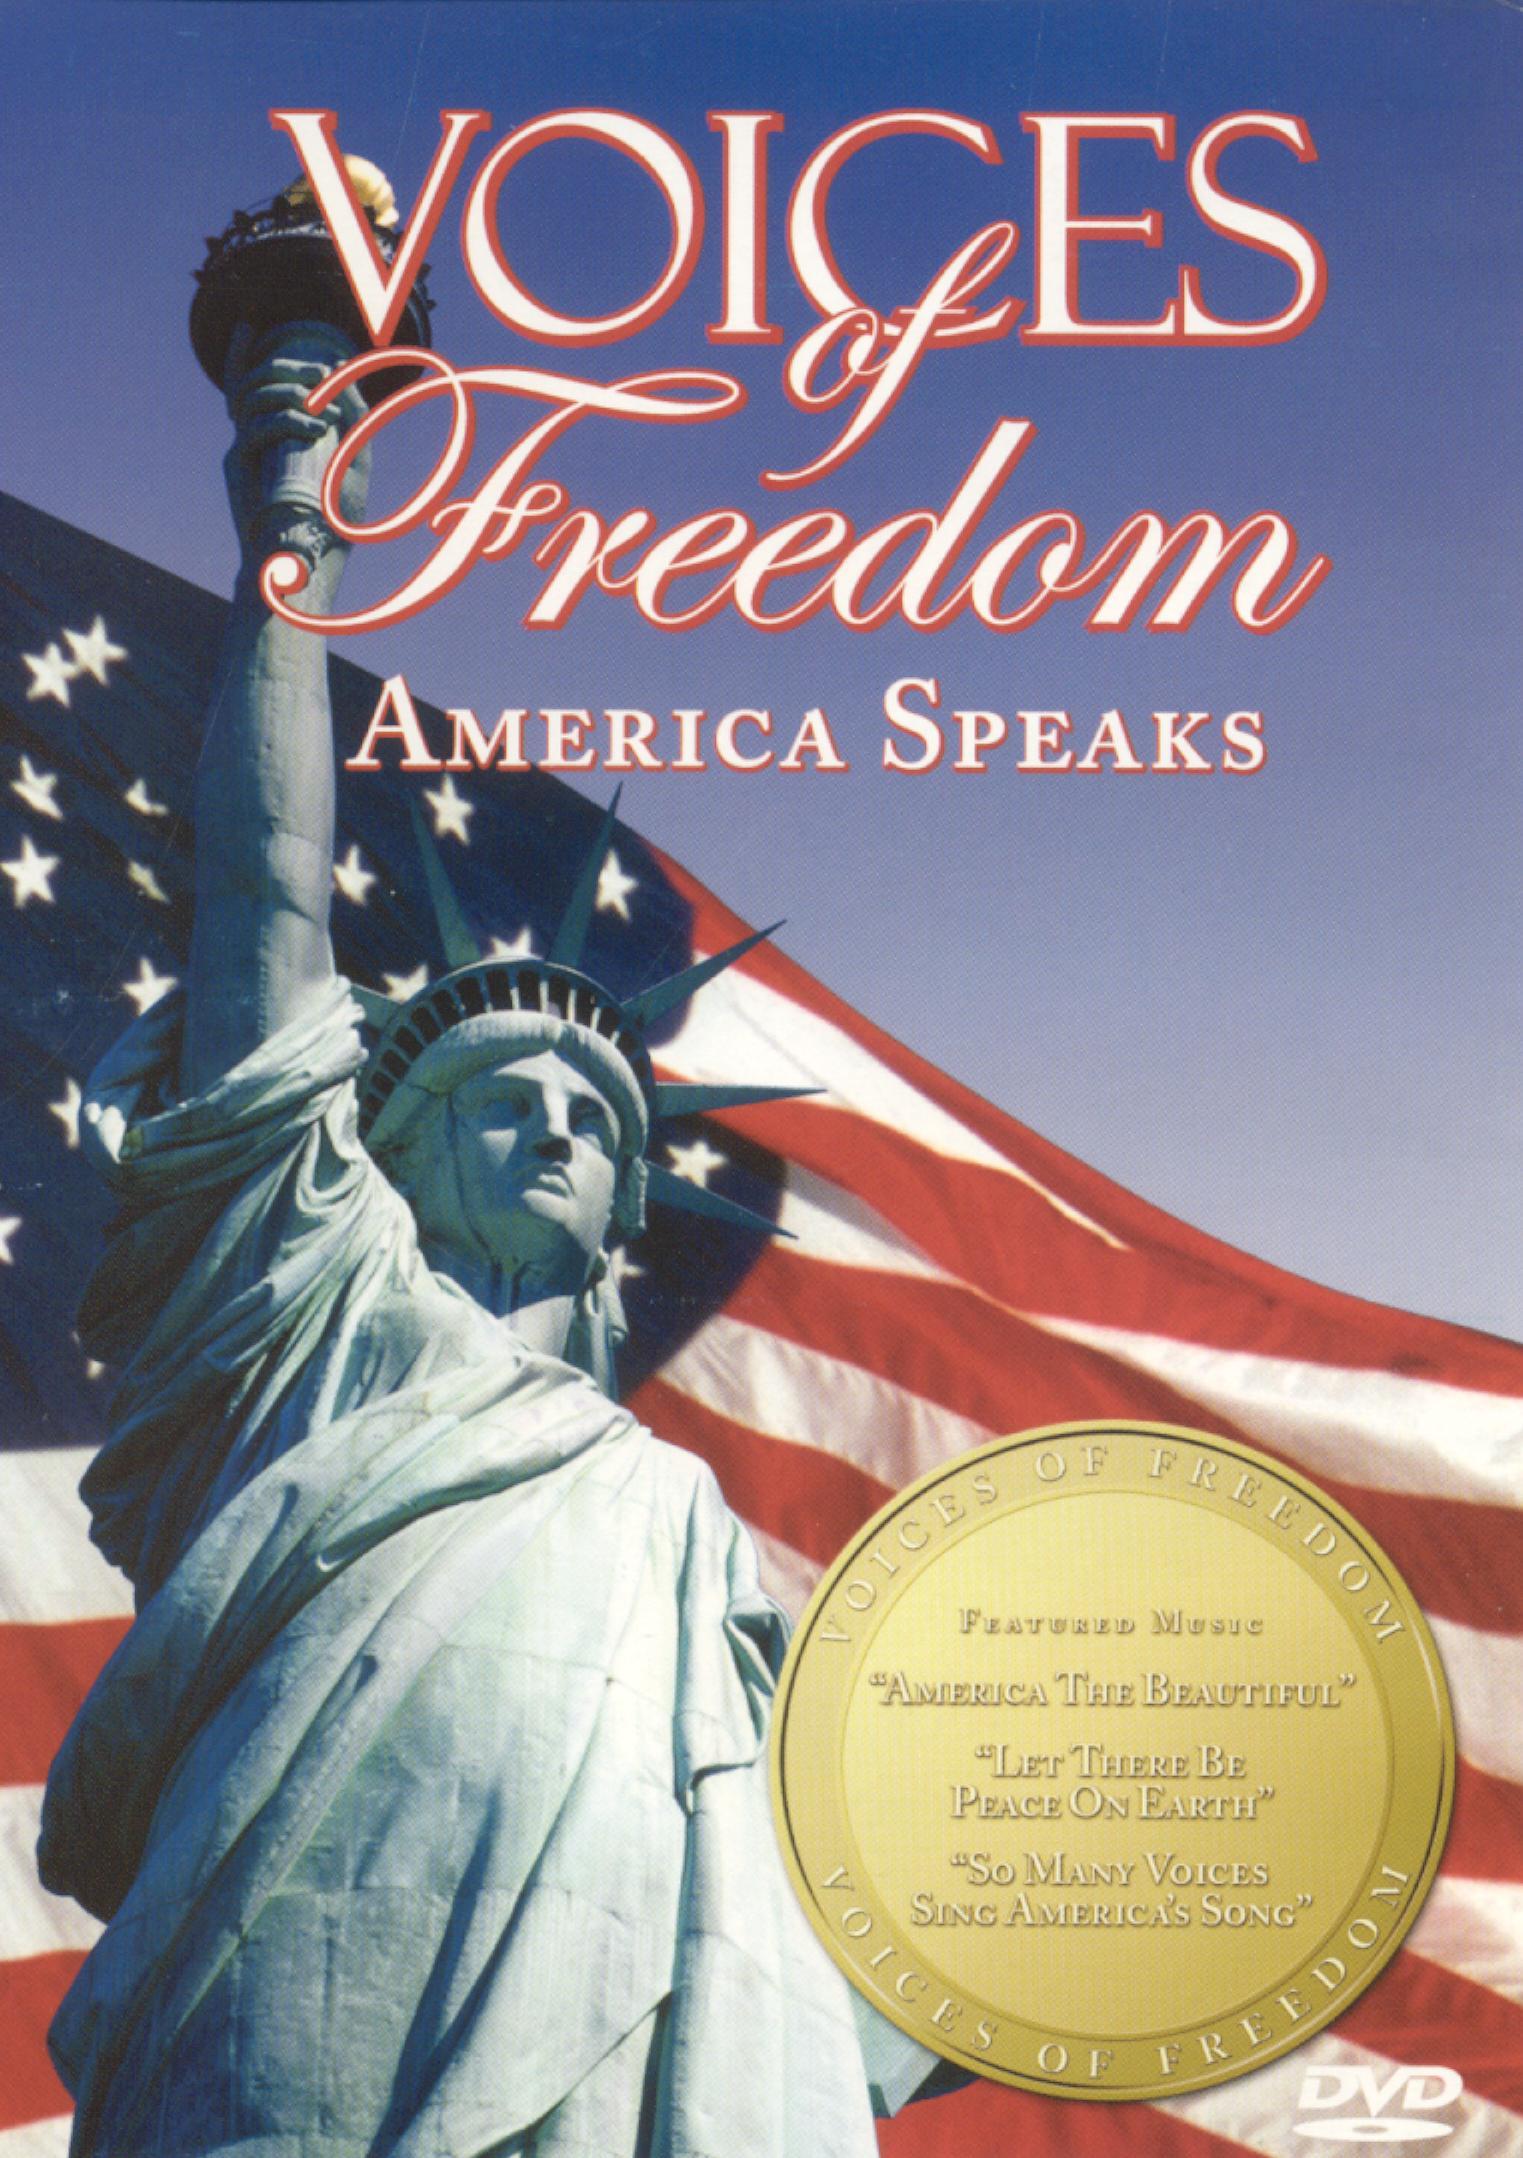 Voices of Freedom: America Speaks